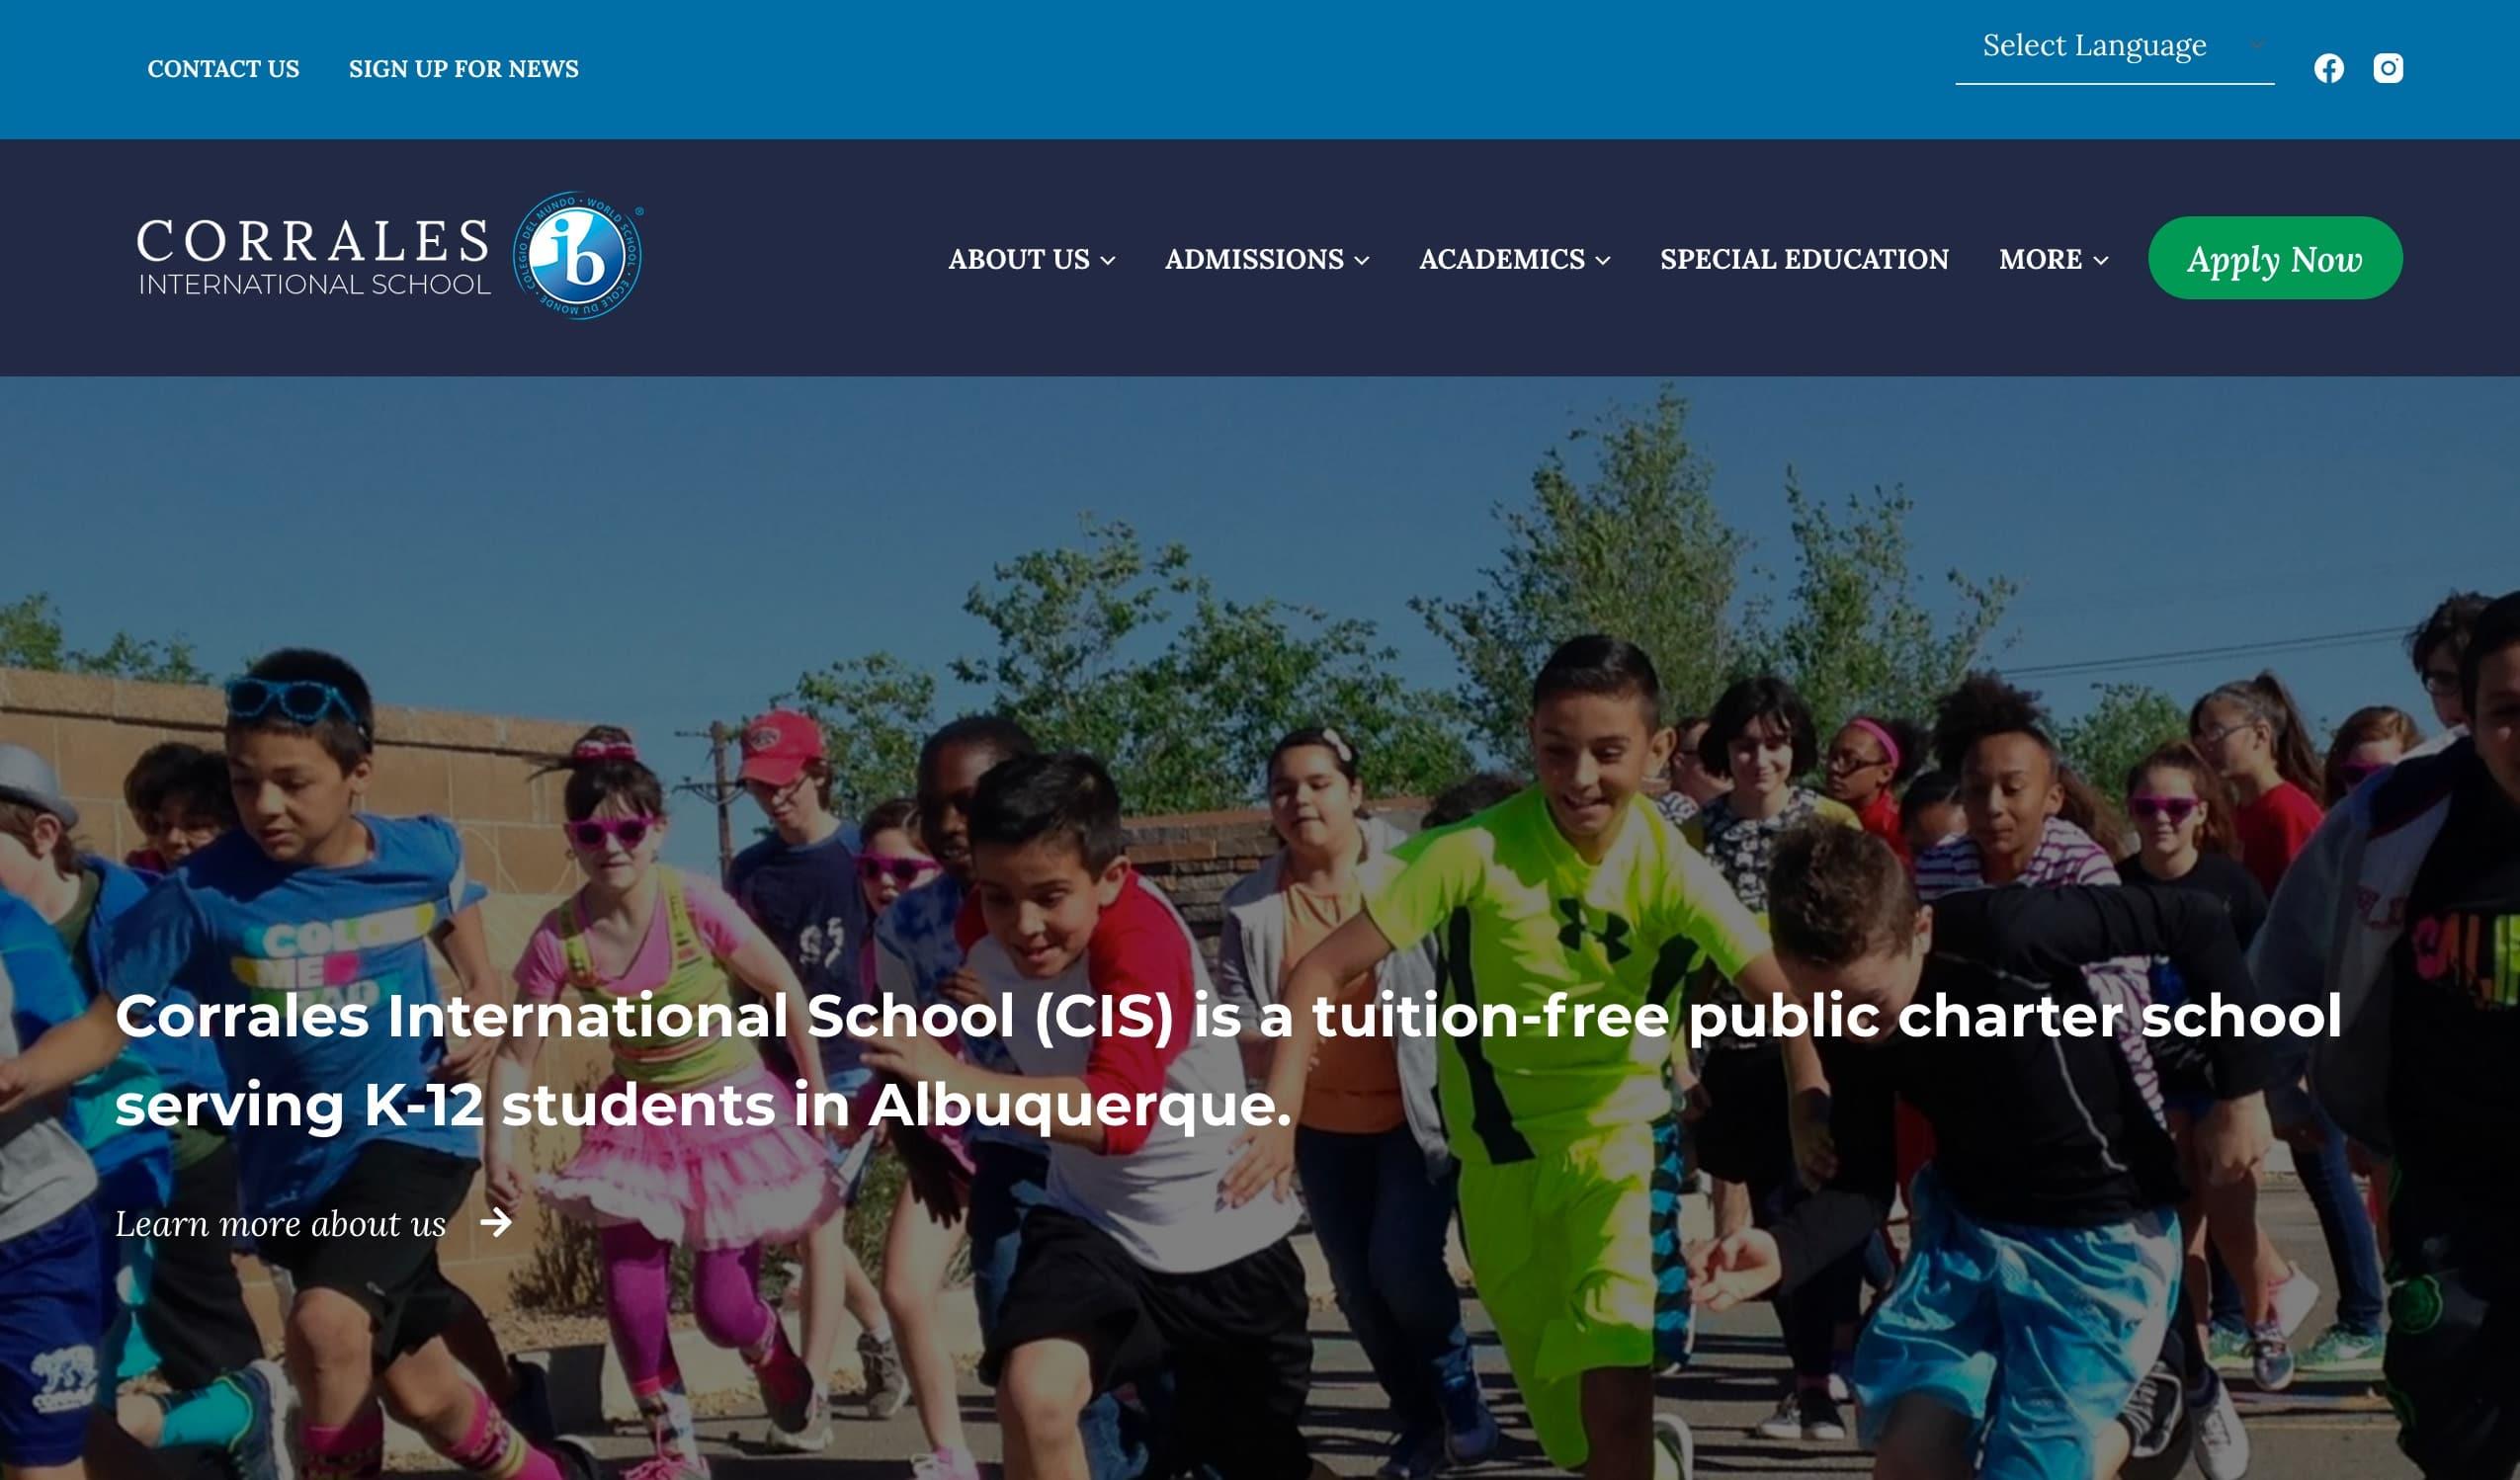 Screenshot of Public Charter International School is Better Represented with a New Website